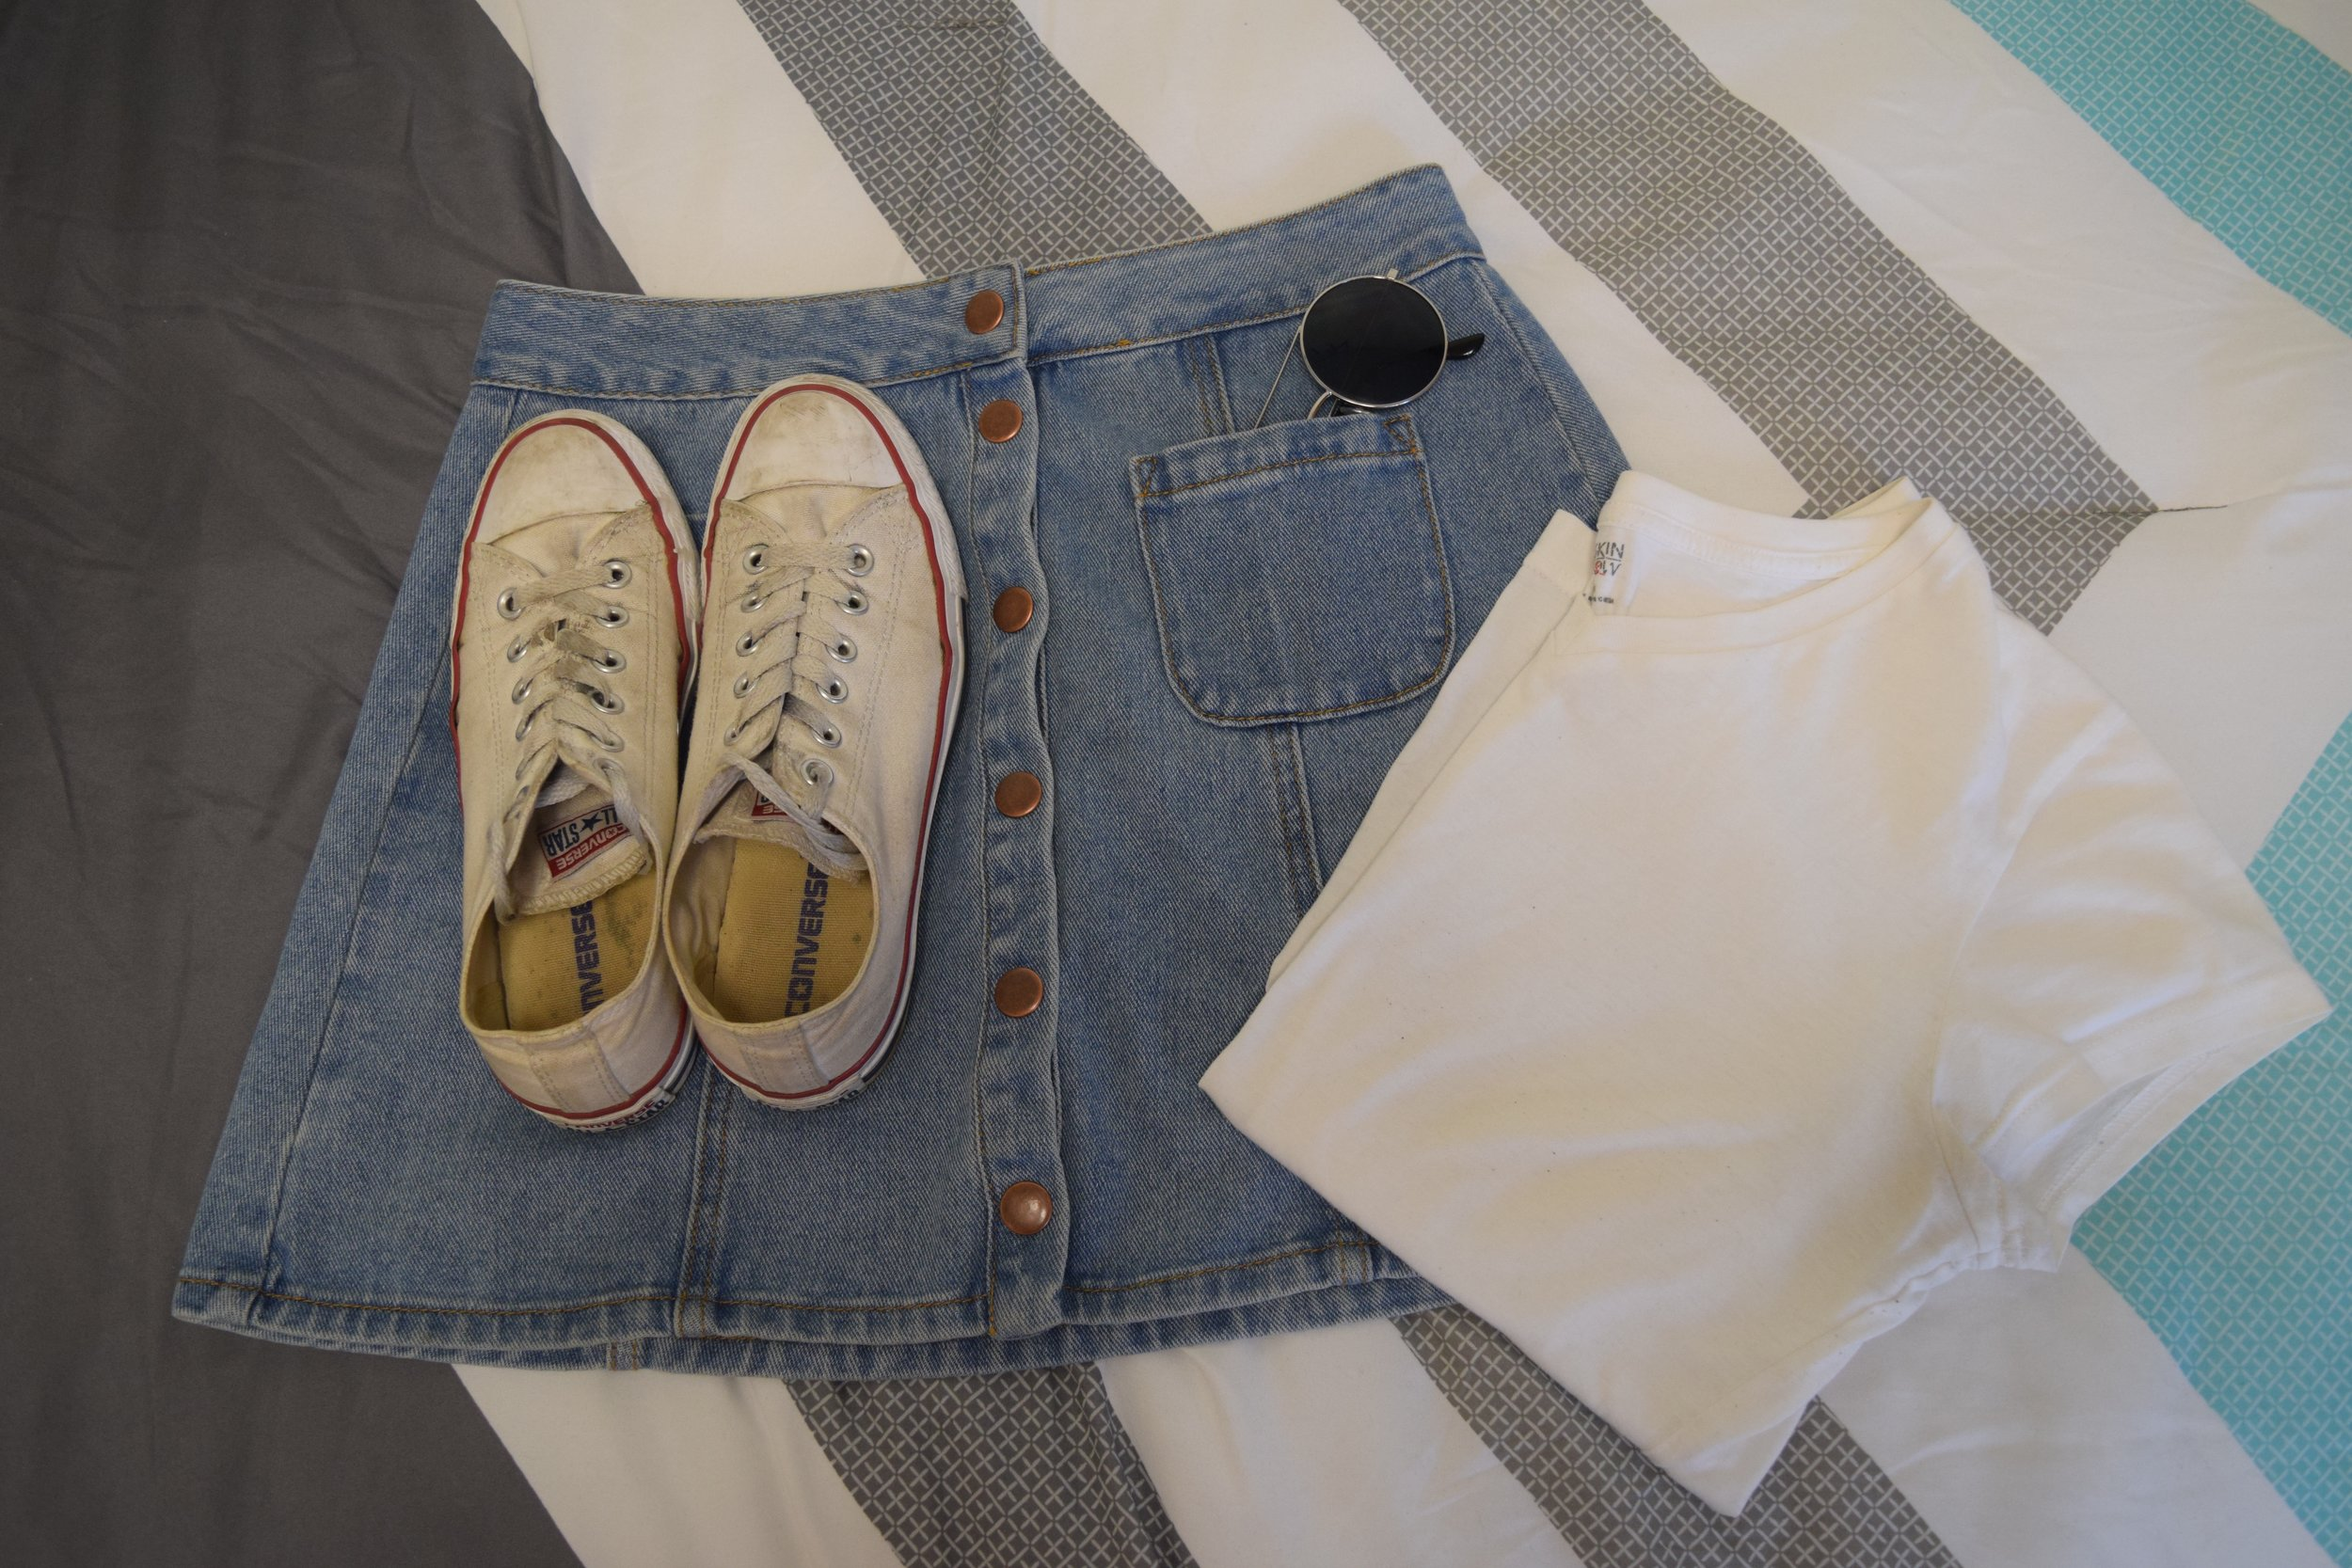 Shirt .  Skirt  (different color).  Sneakers .  Sunglasses  (similar).